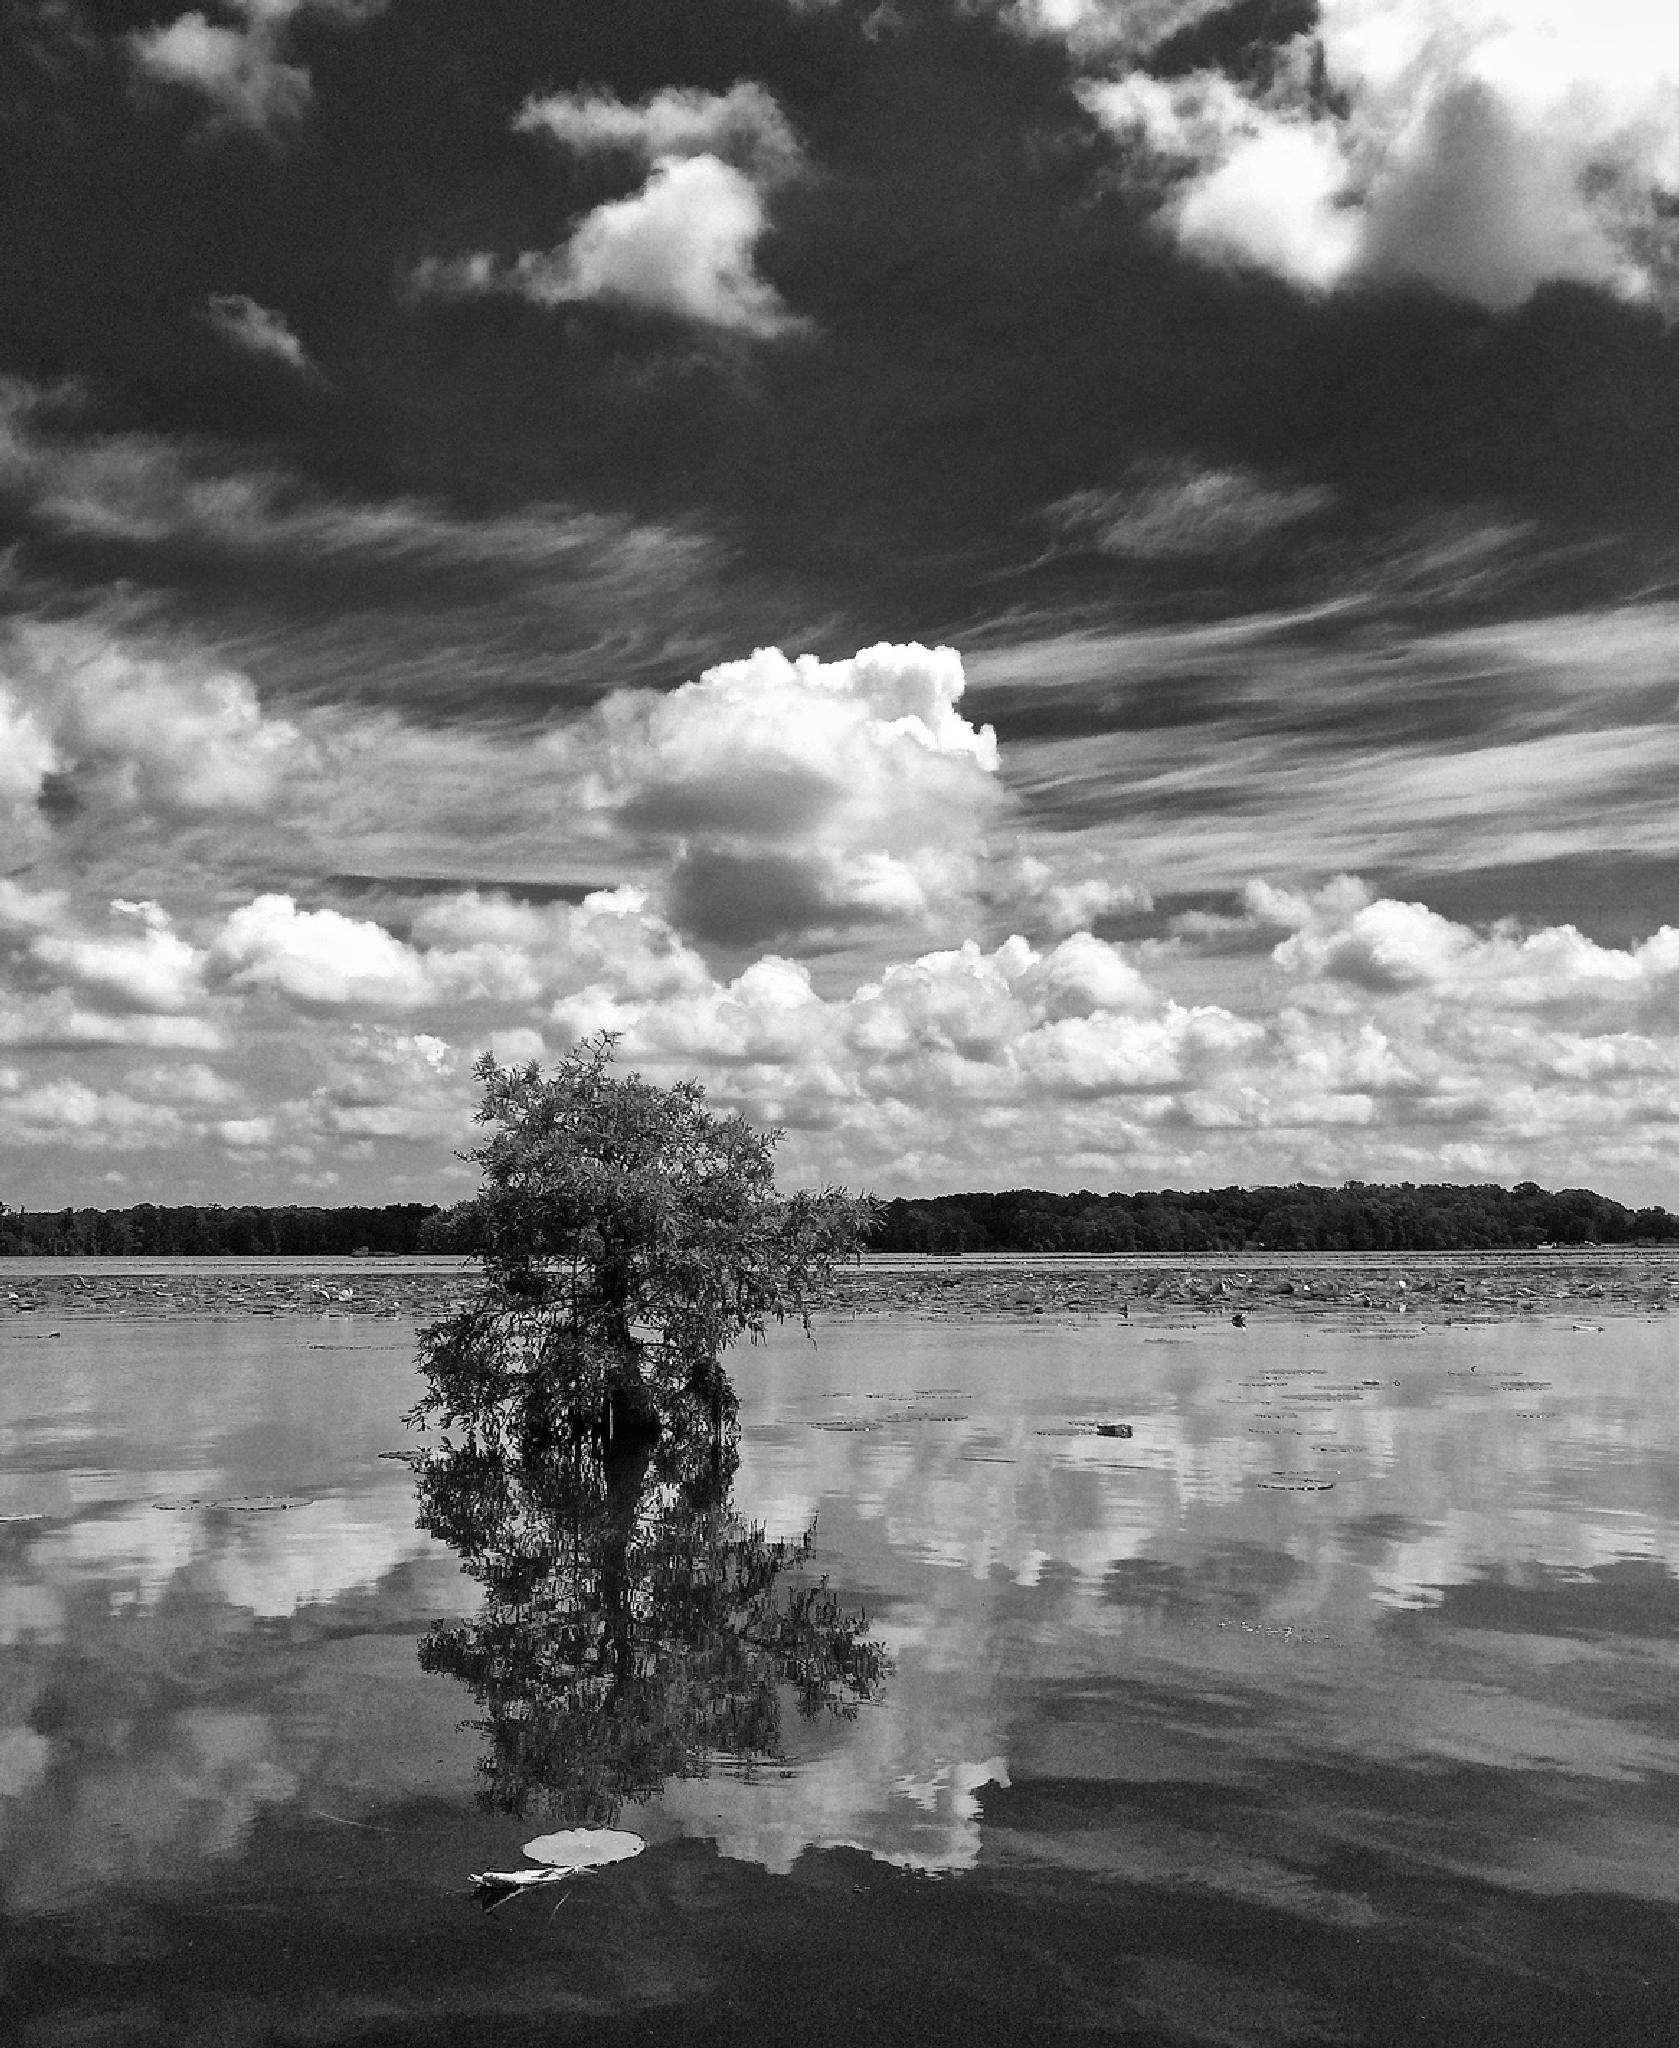 Lonesome reflection by Zeralda